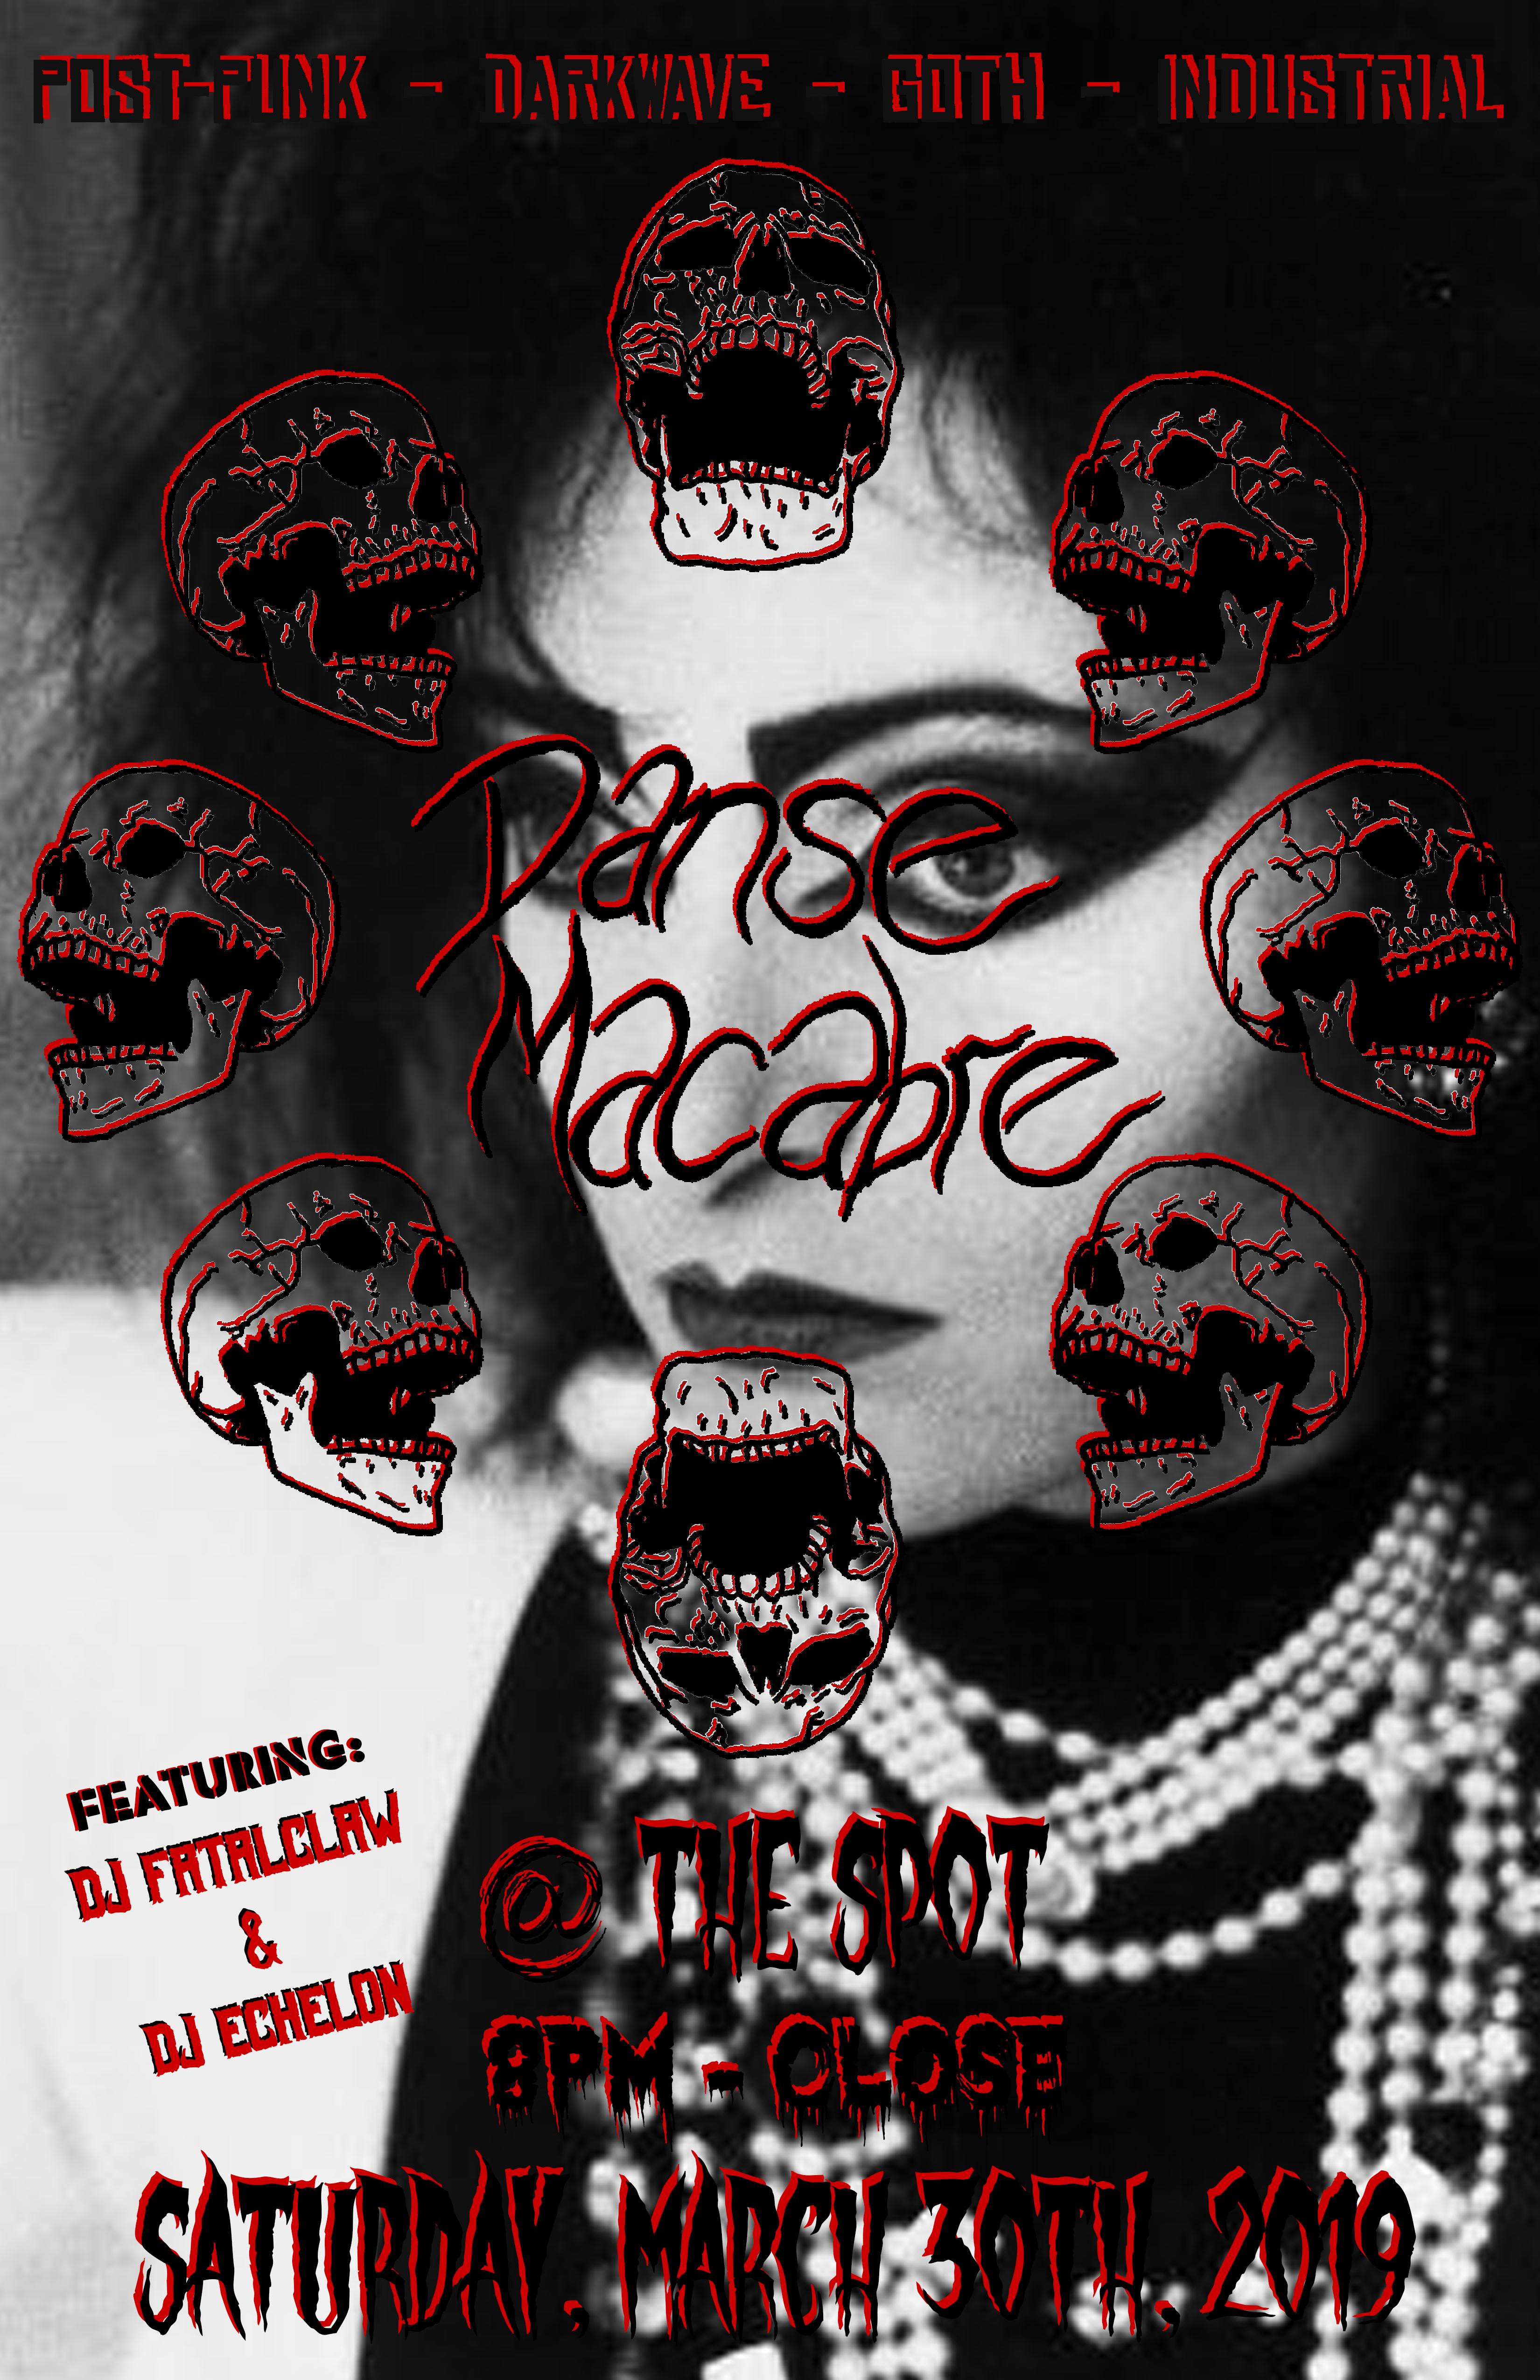 Danse Macabre 3-30-19